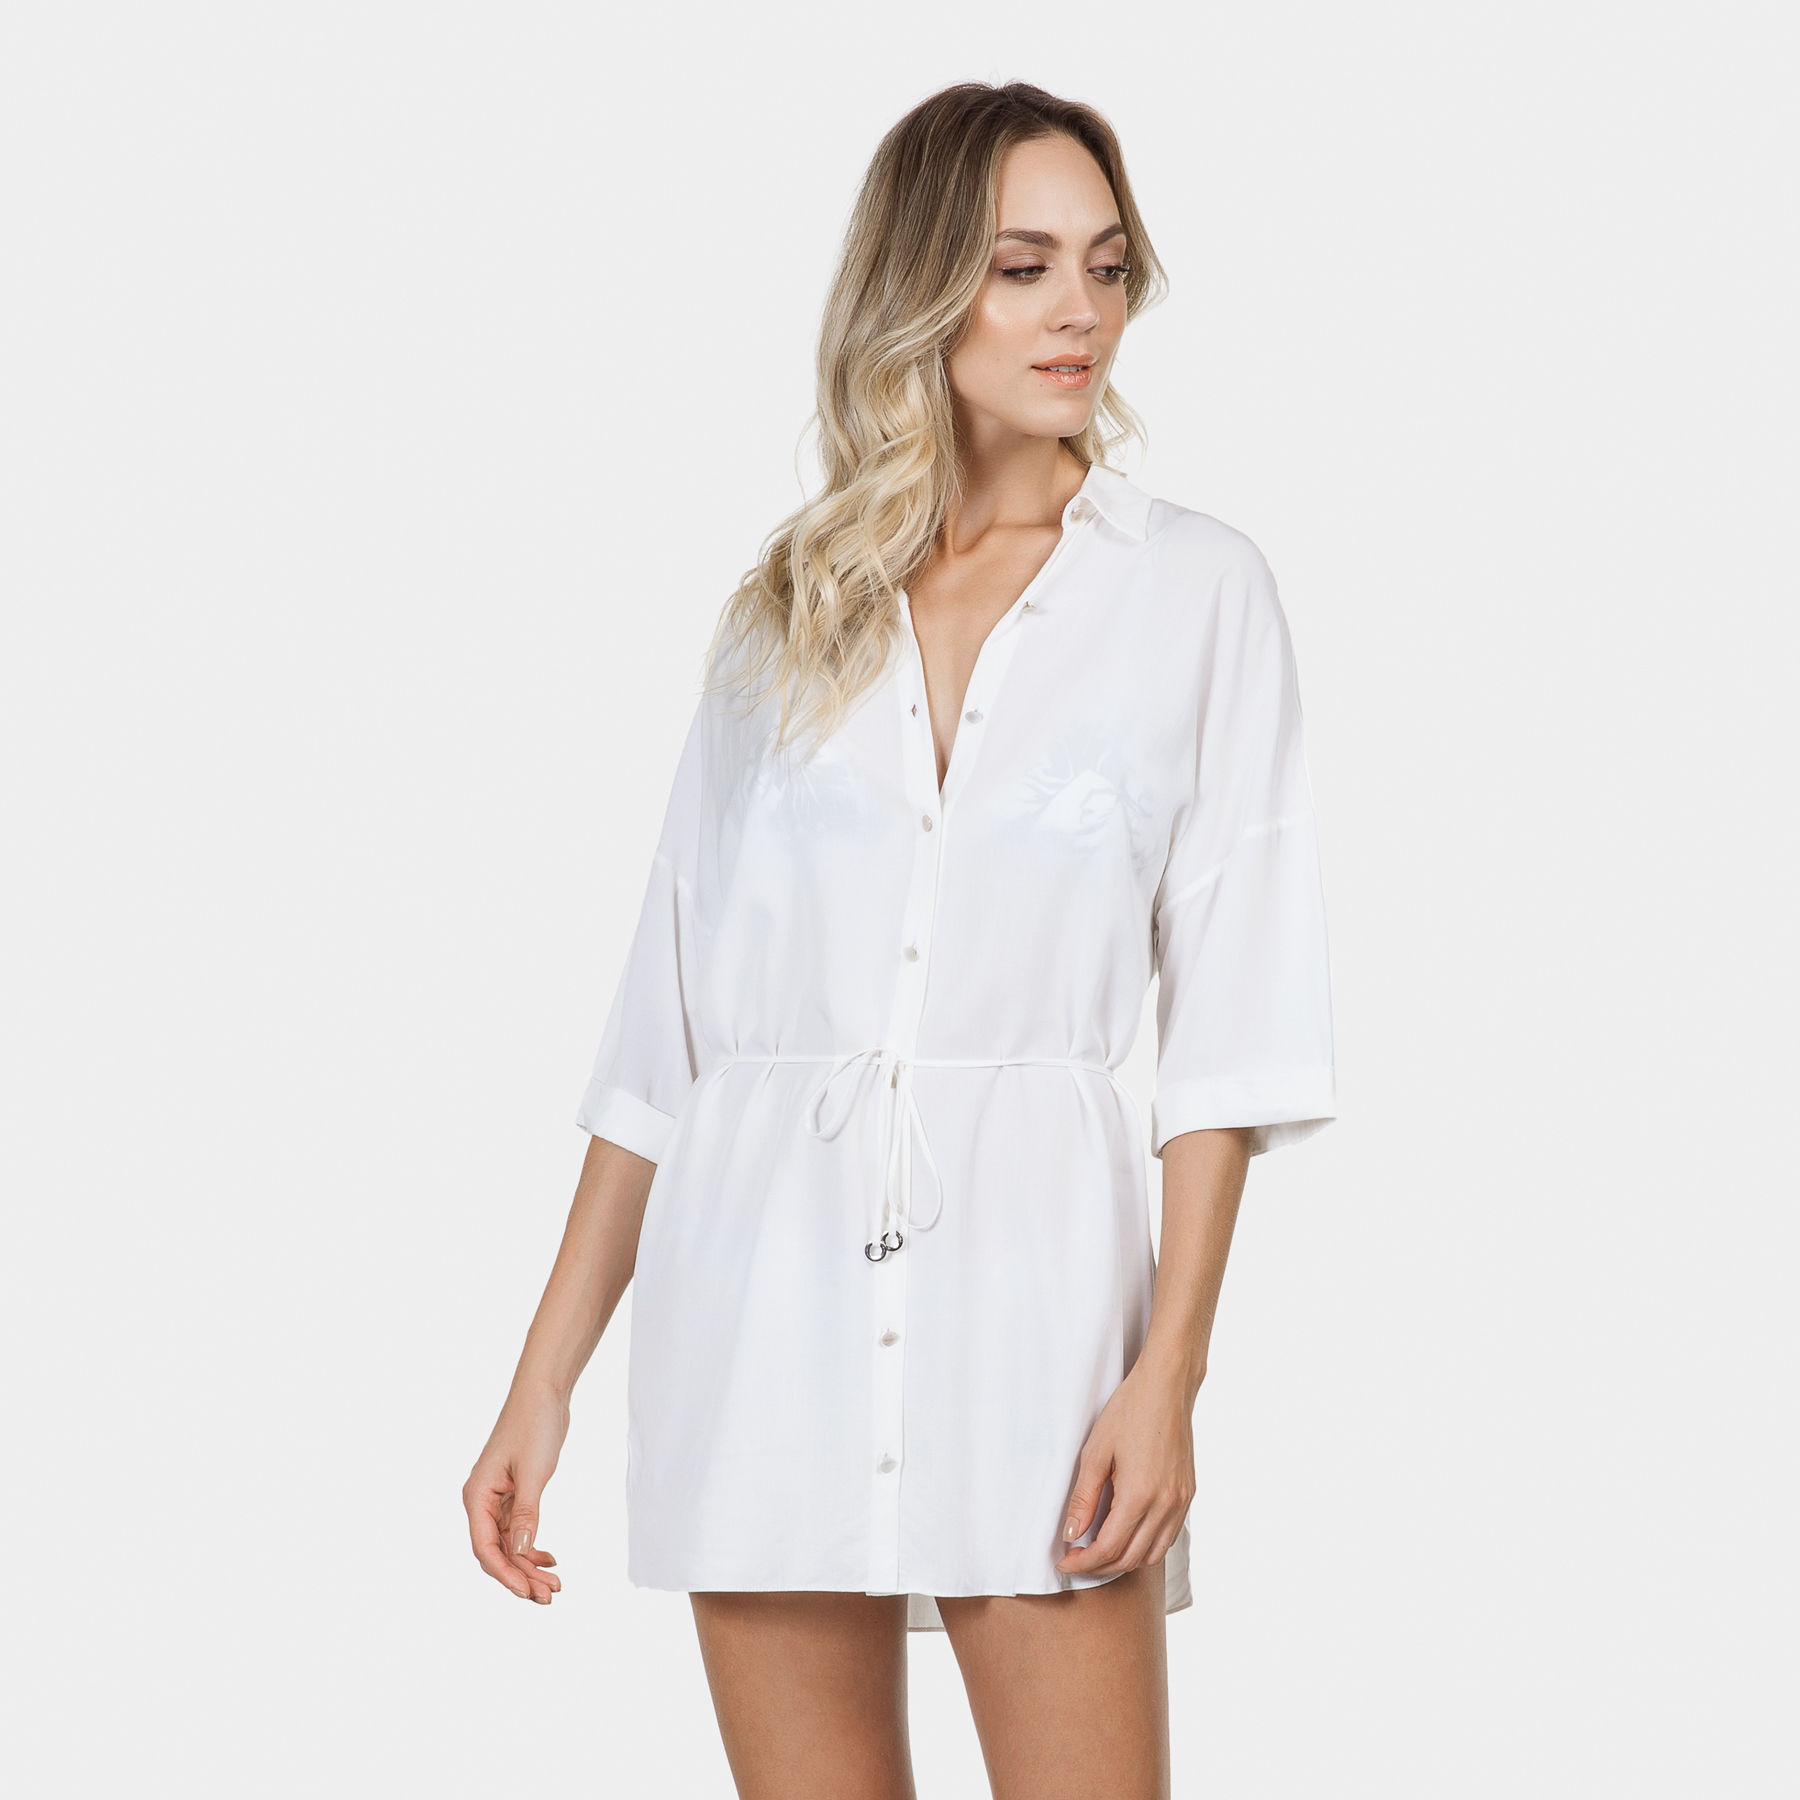 502830366 Camisa Manga 3/4 Saída de Praia Branco Off White - Lez a Lez